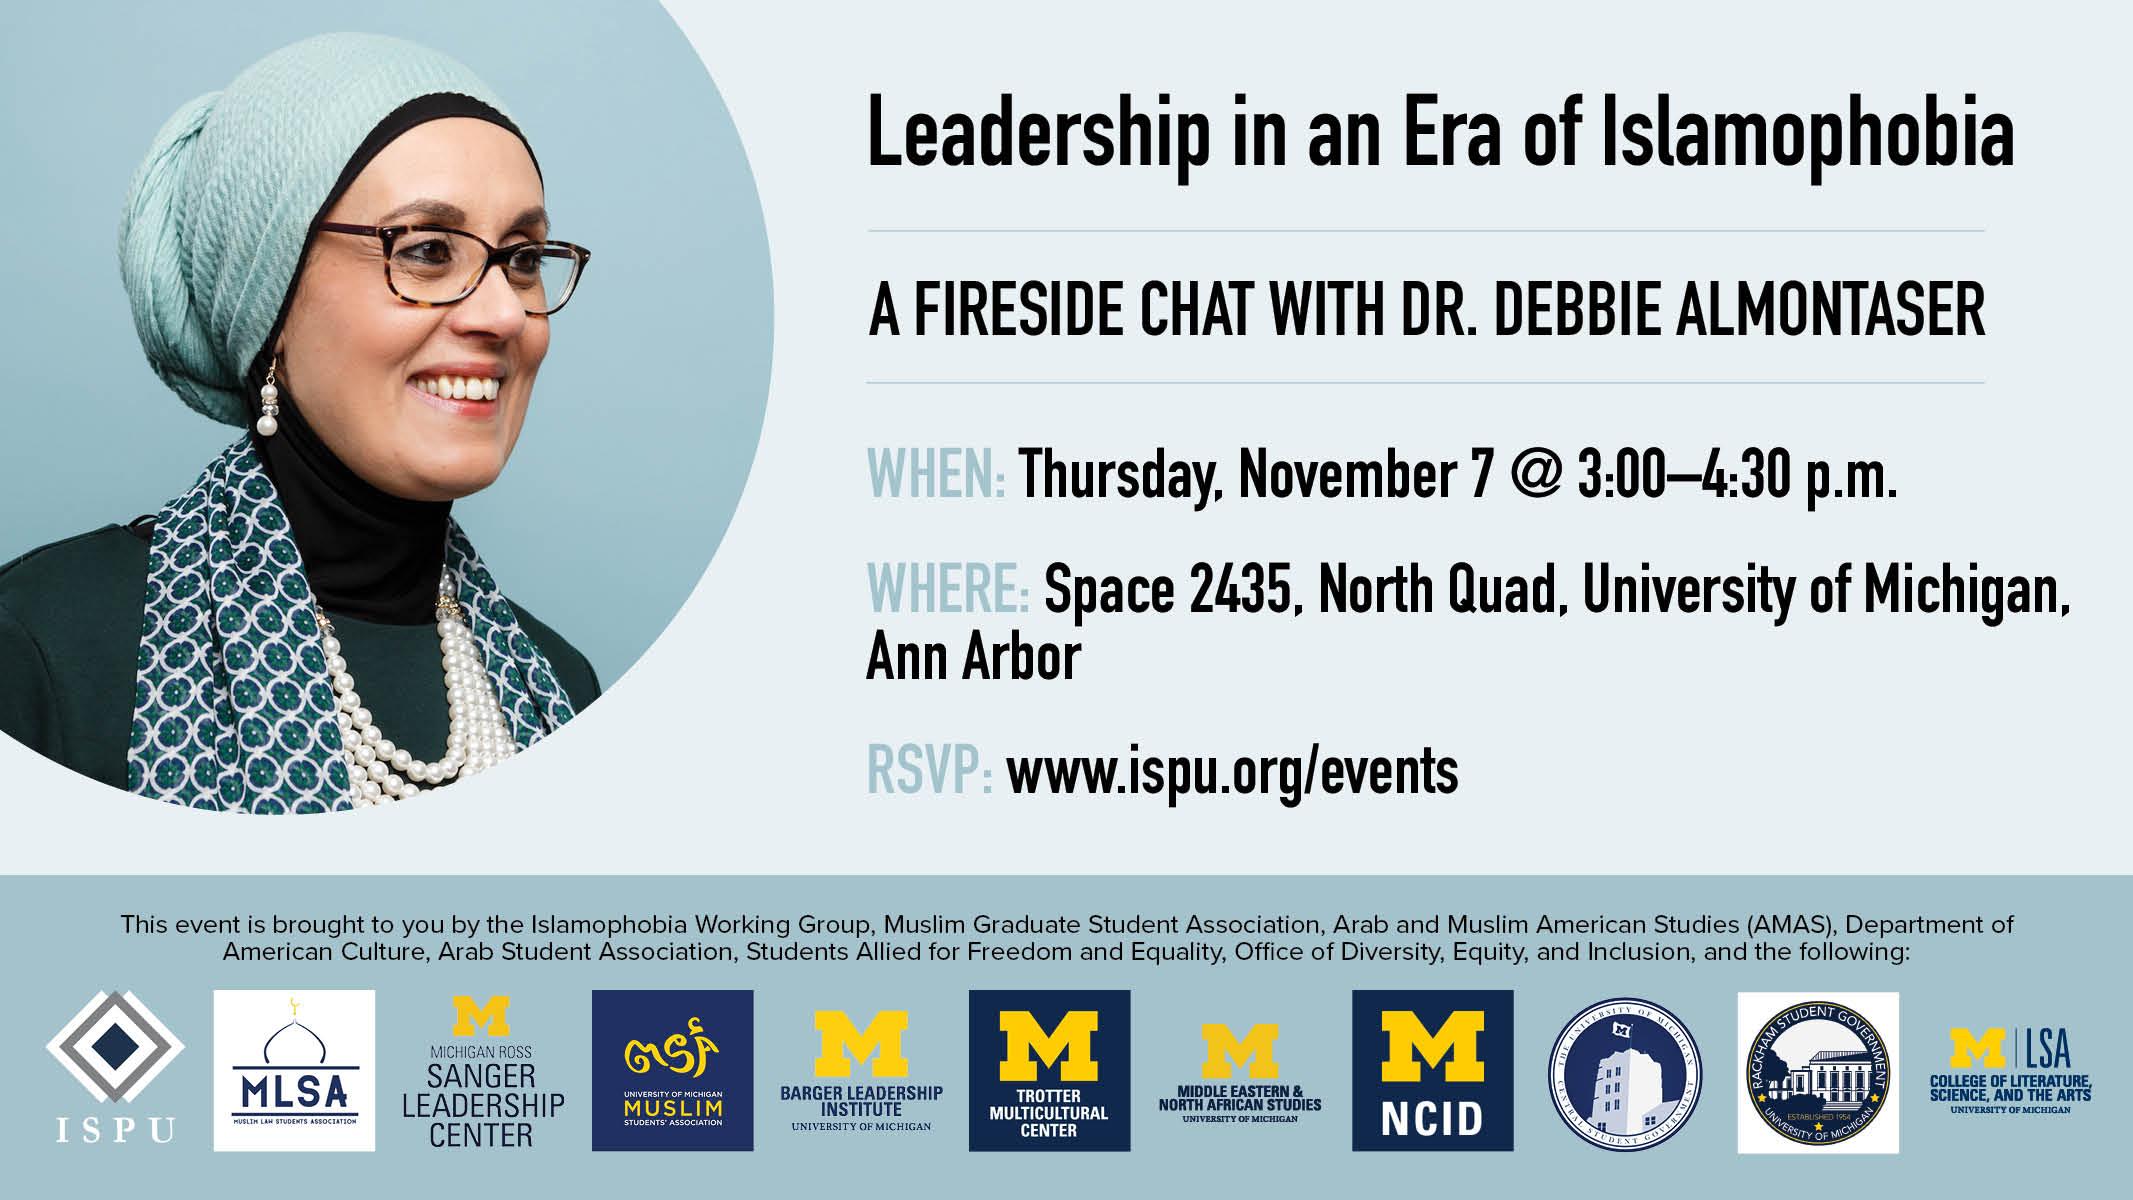 Leadership in an era of Islamophobia event flyer